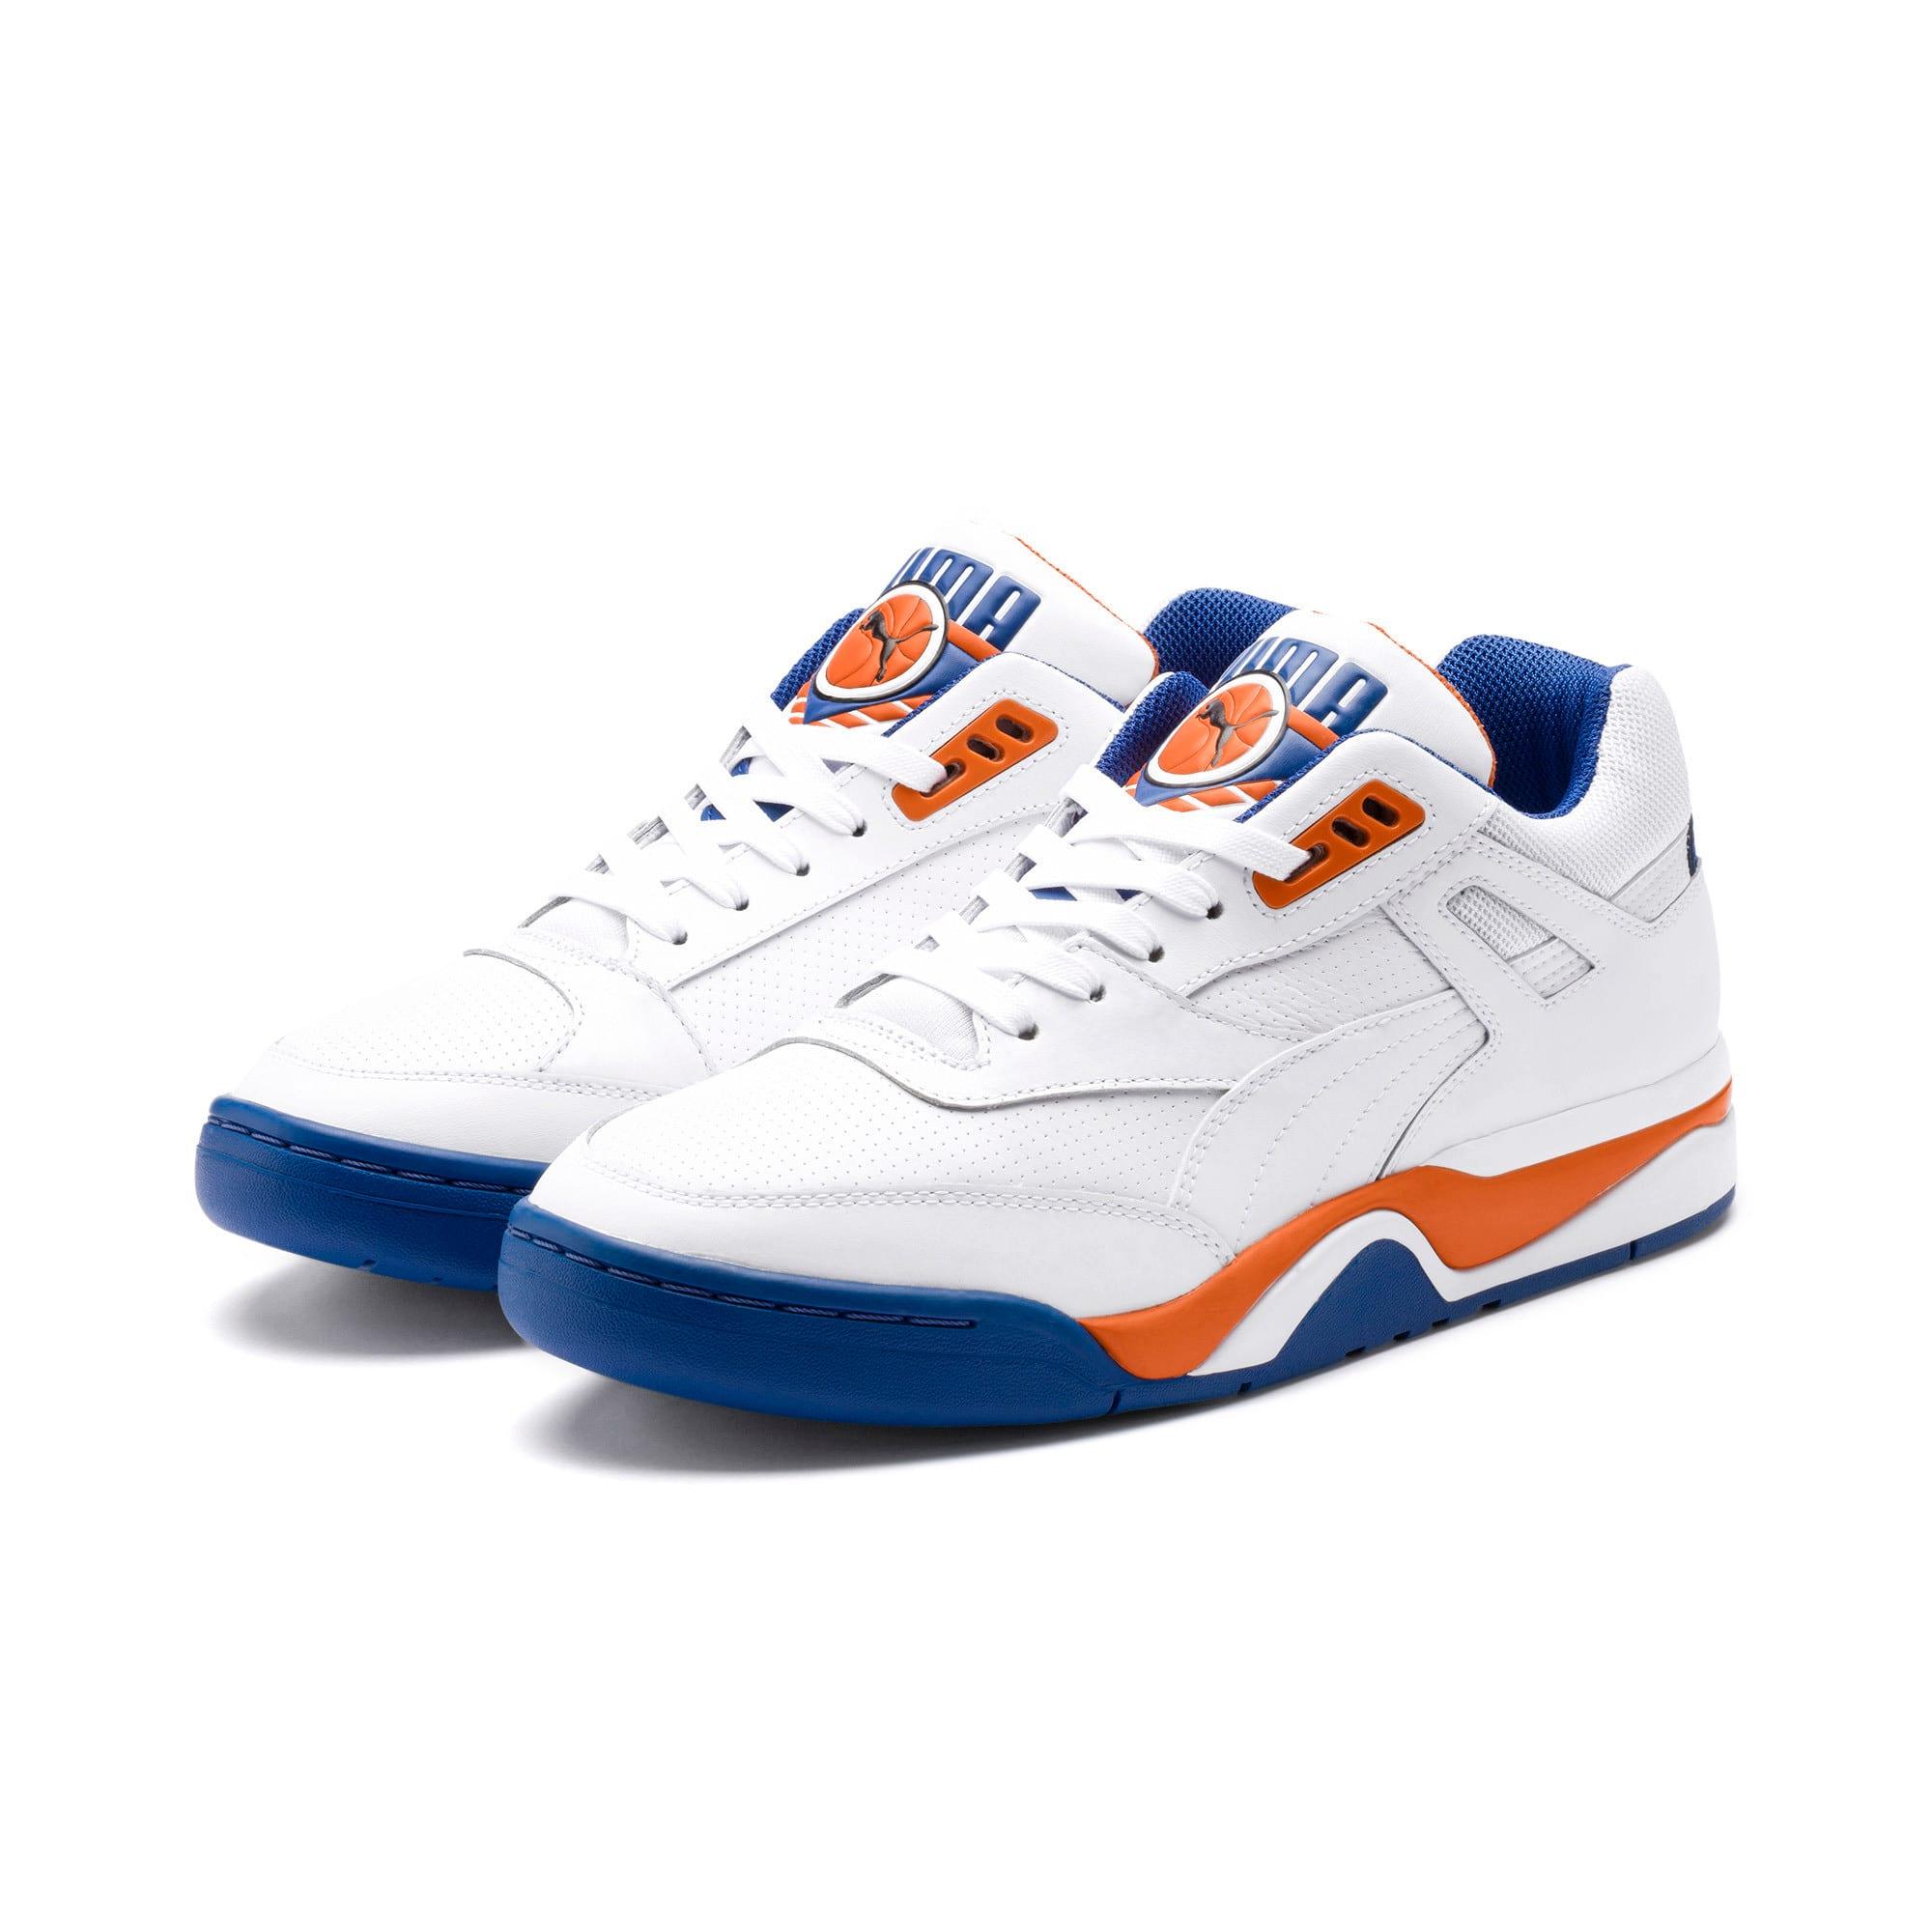 Thumbnail 2 of Palace Guard Sneakers, P White-Jaffa Orange-G Blue, medium